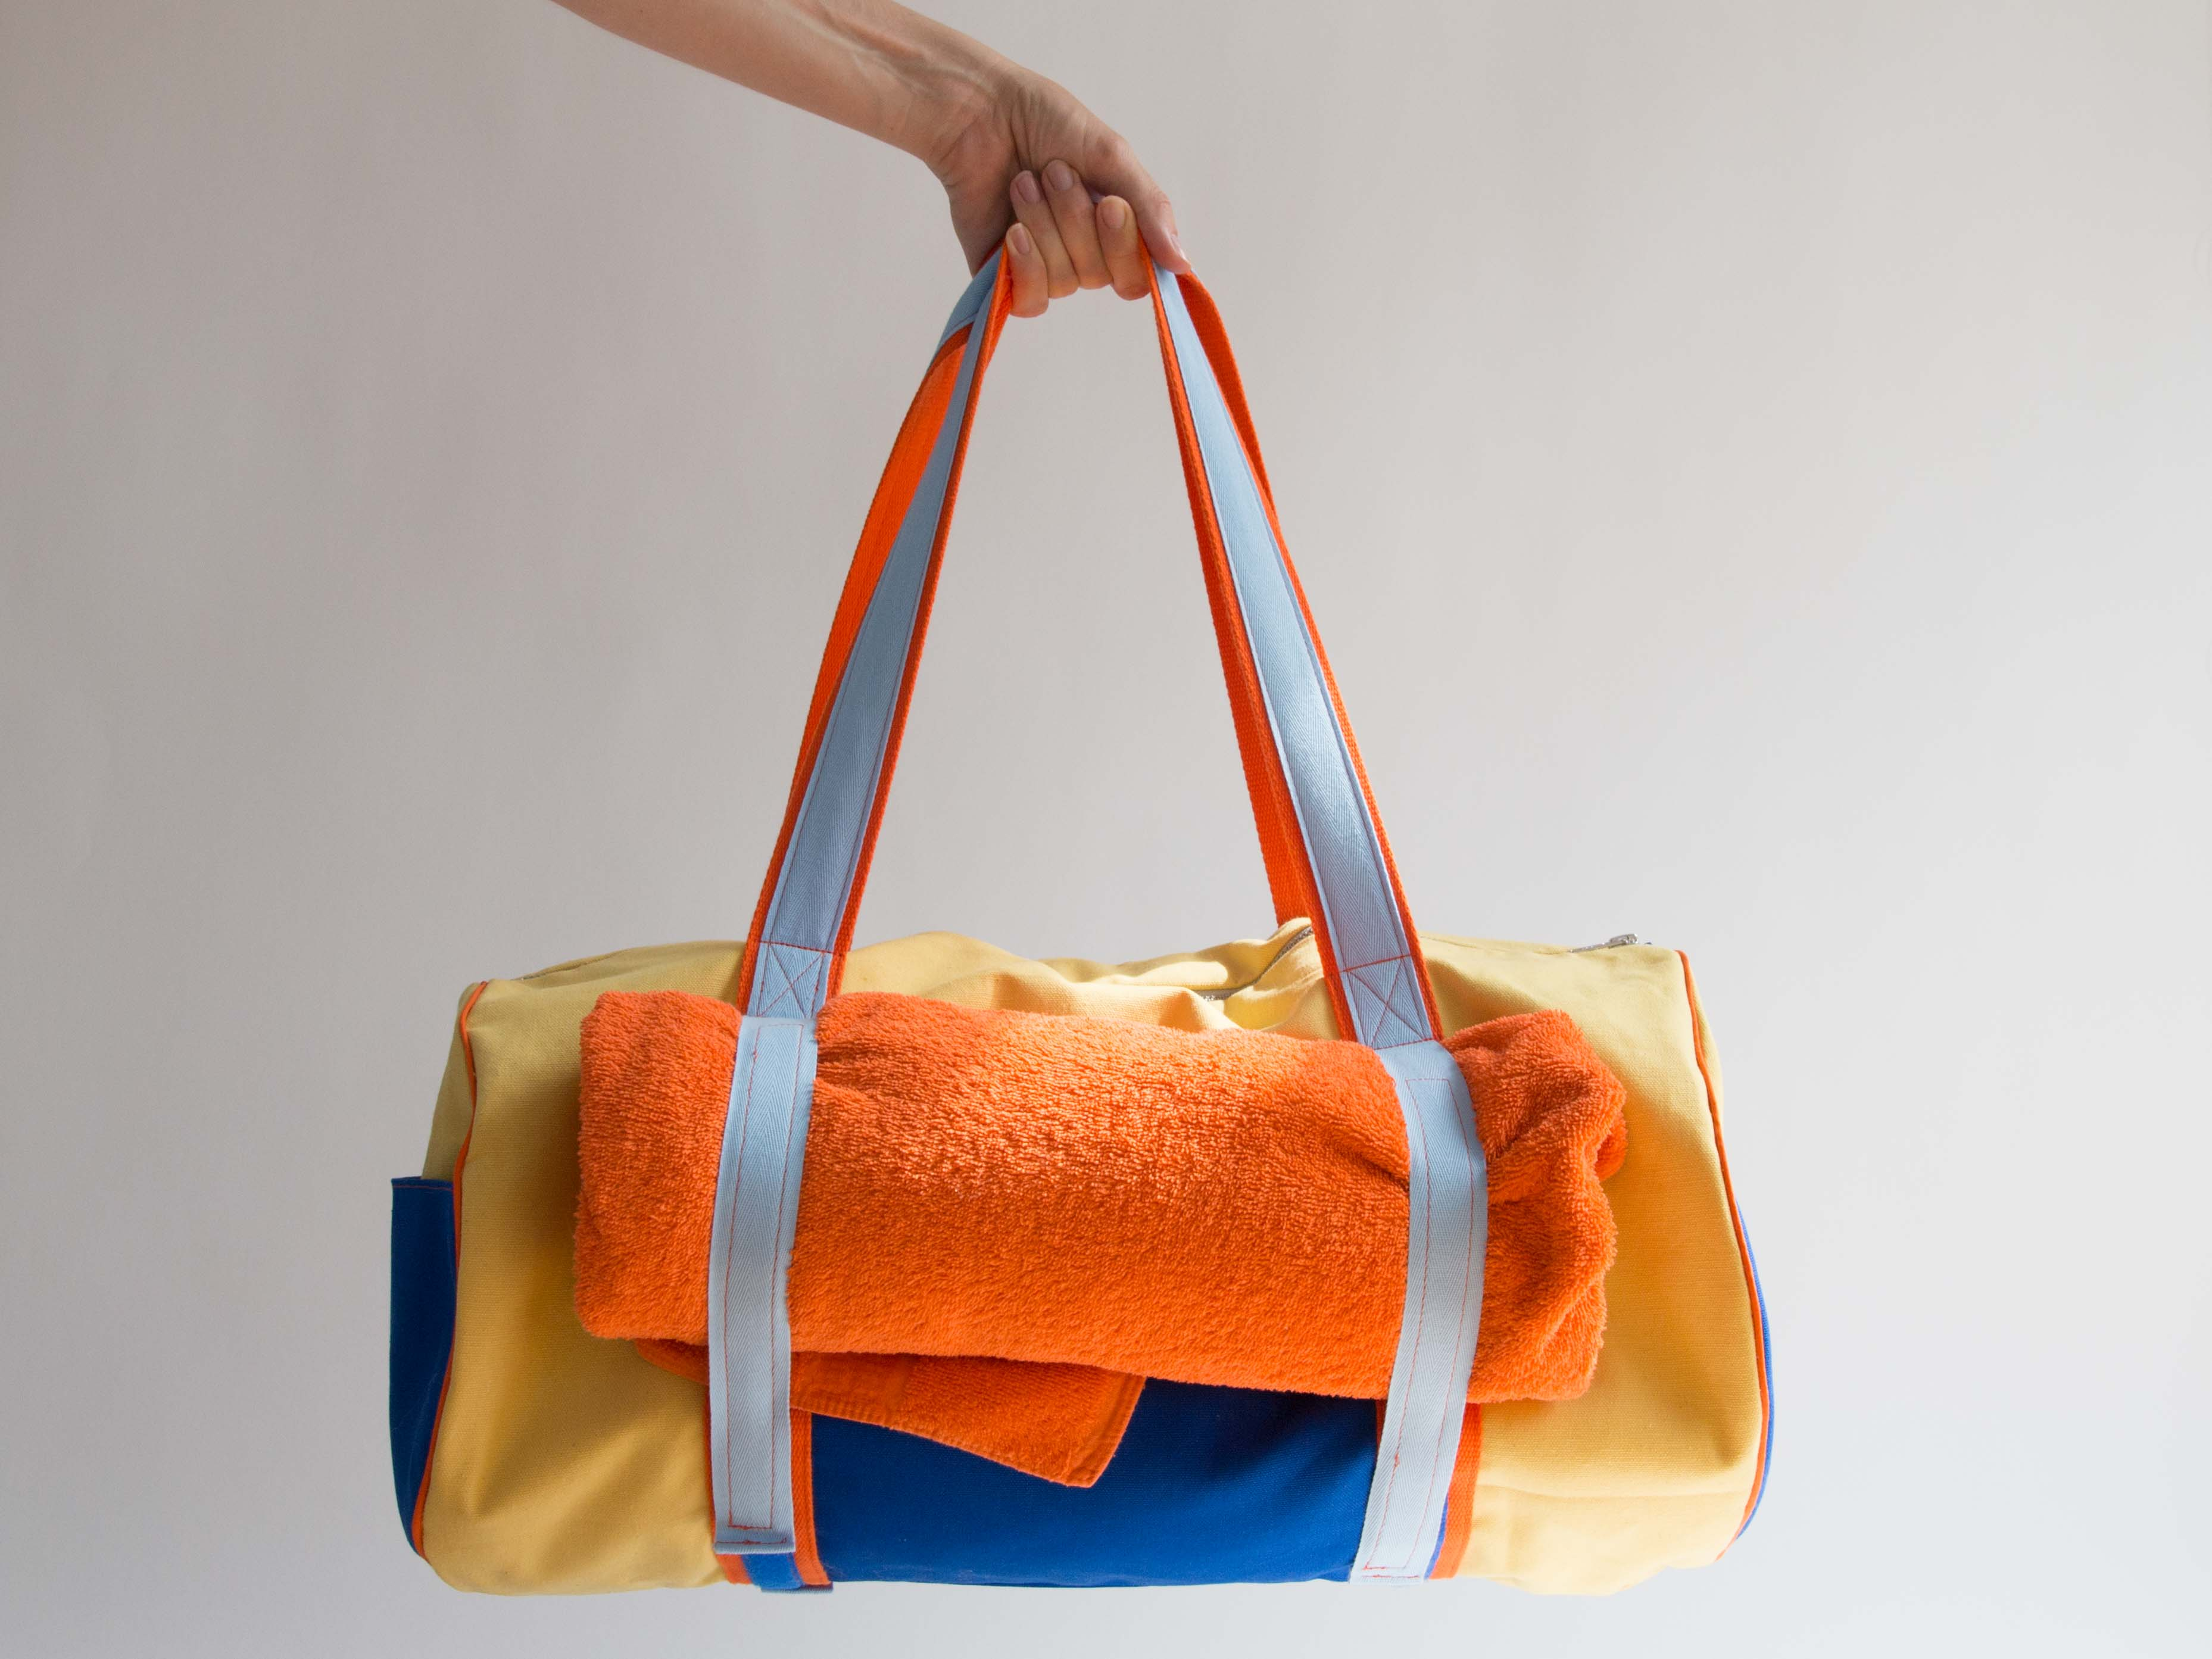 Yoga Beach Duffle Bag